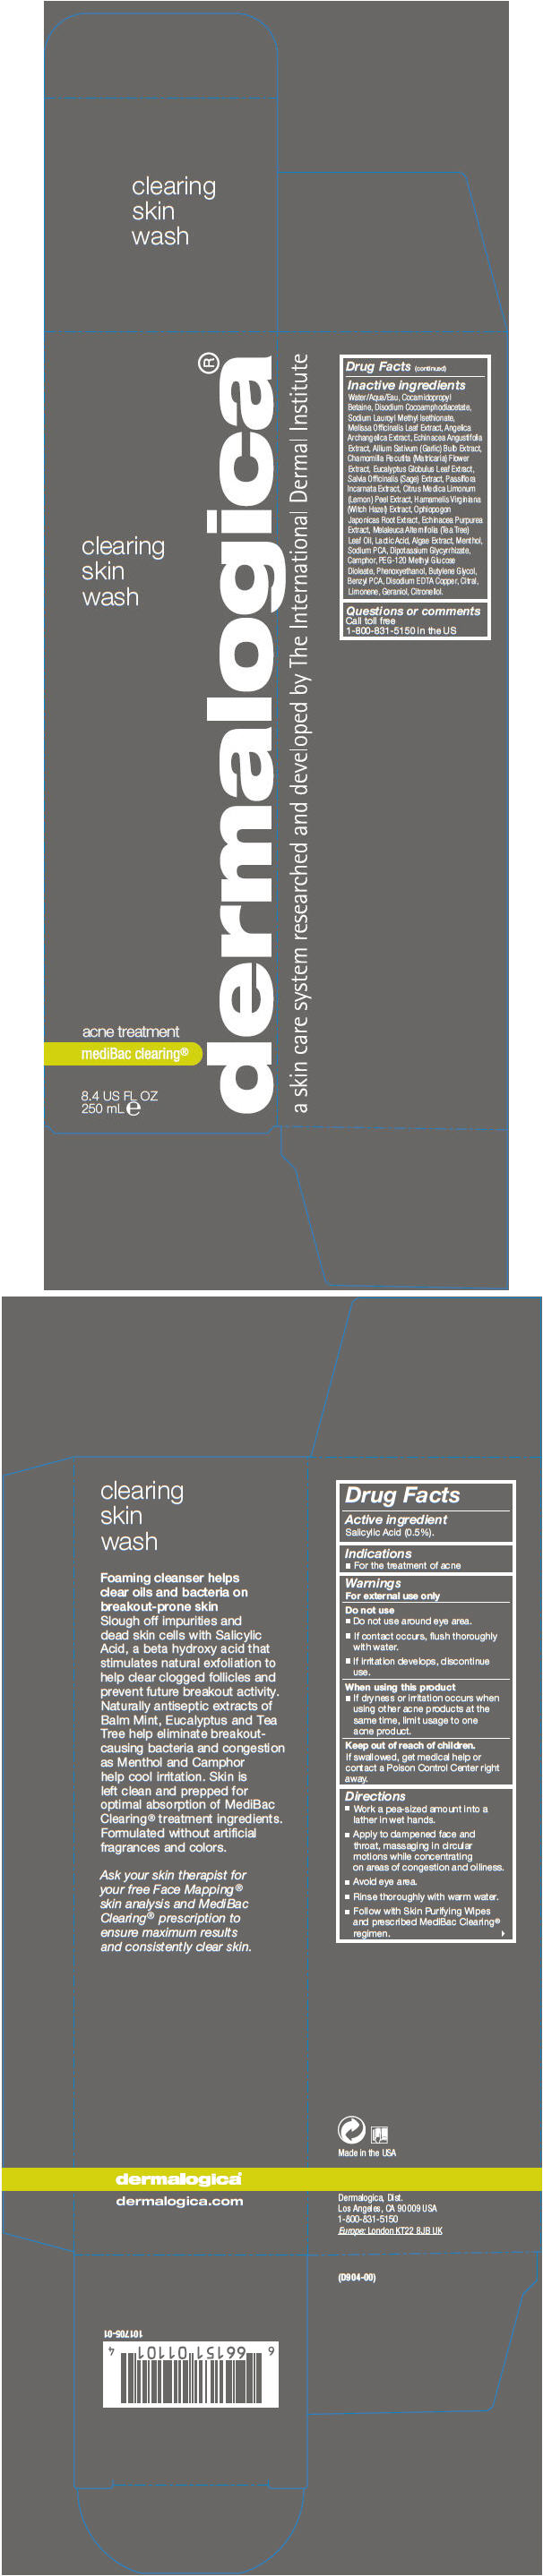 Clearing Skin Wash (Salicylic Acid) Liquid [Dermalogica, Inc.]